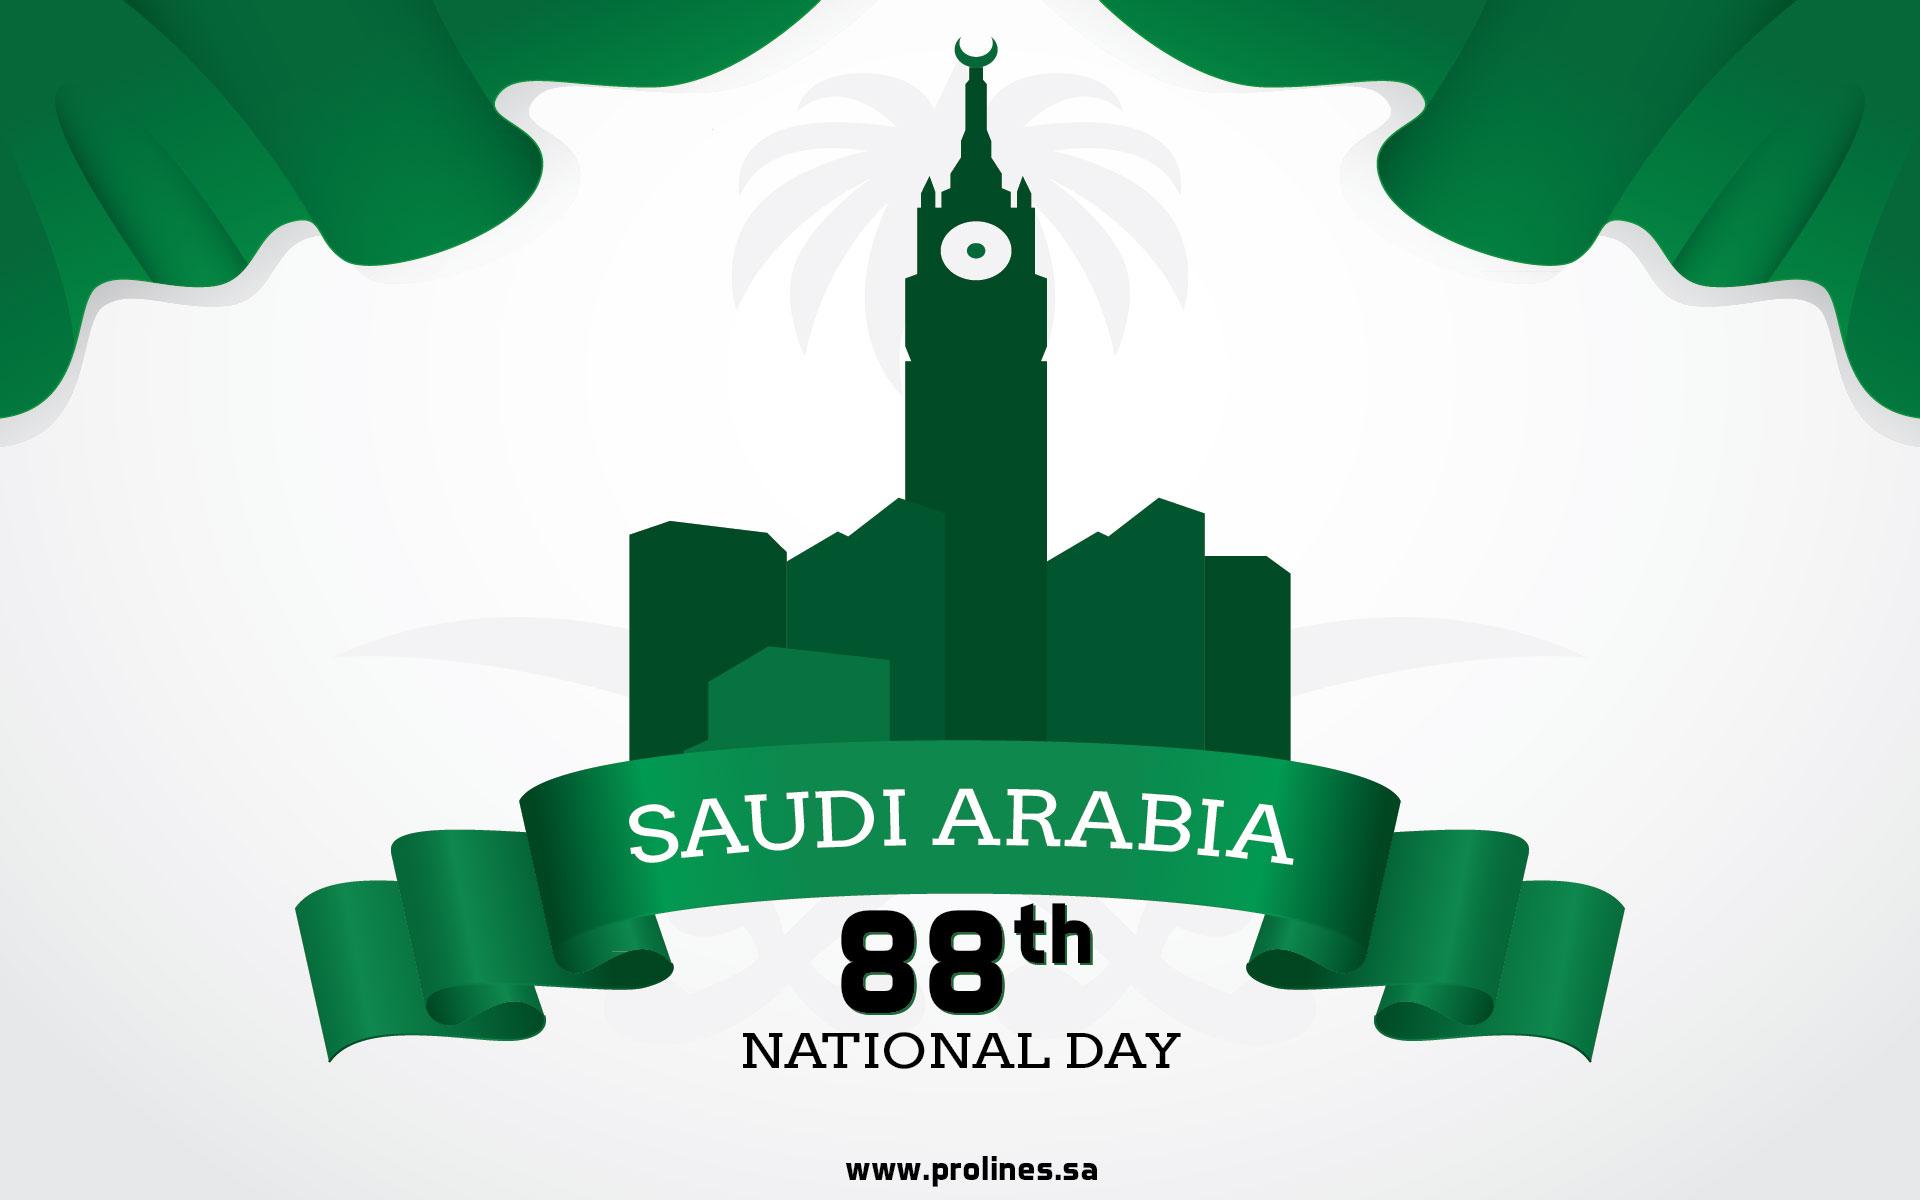 All Car Logos Wallpapers Saudi National Day 2018 Wallpapers Hd اليوم الوطني